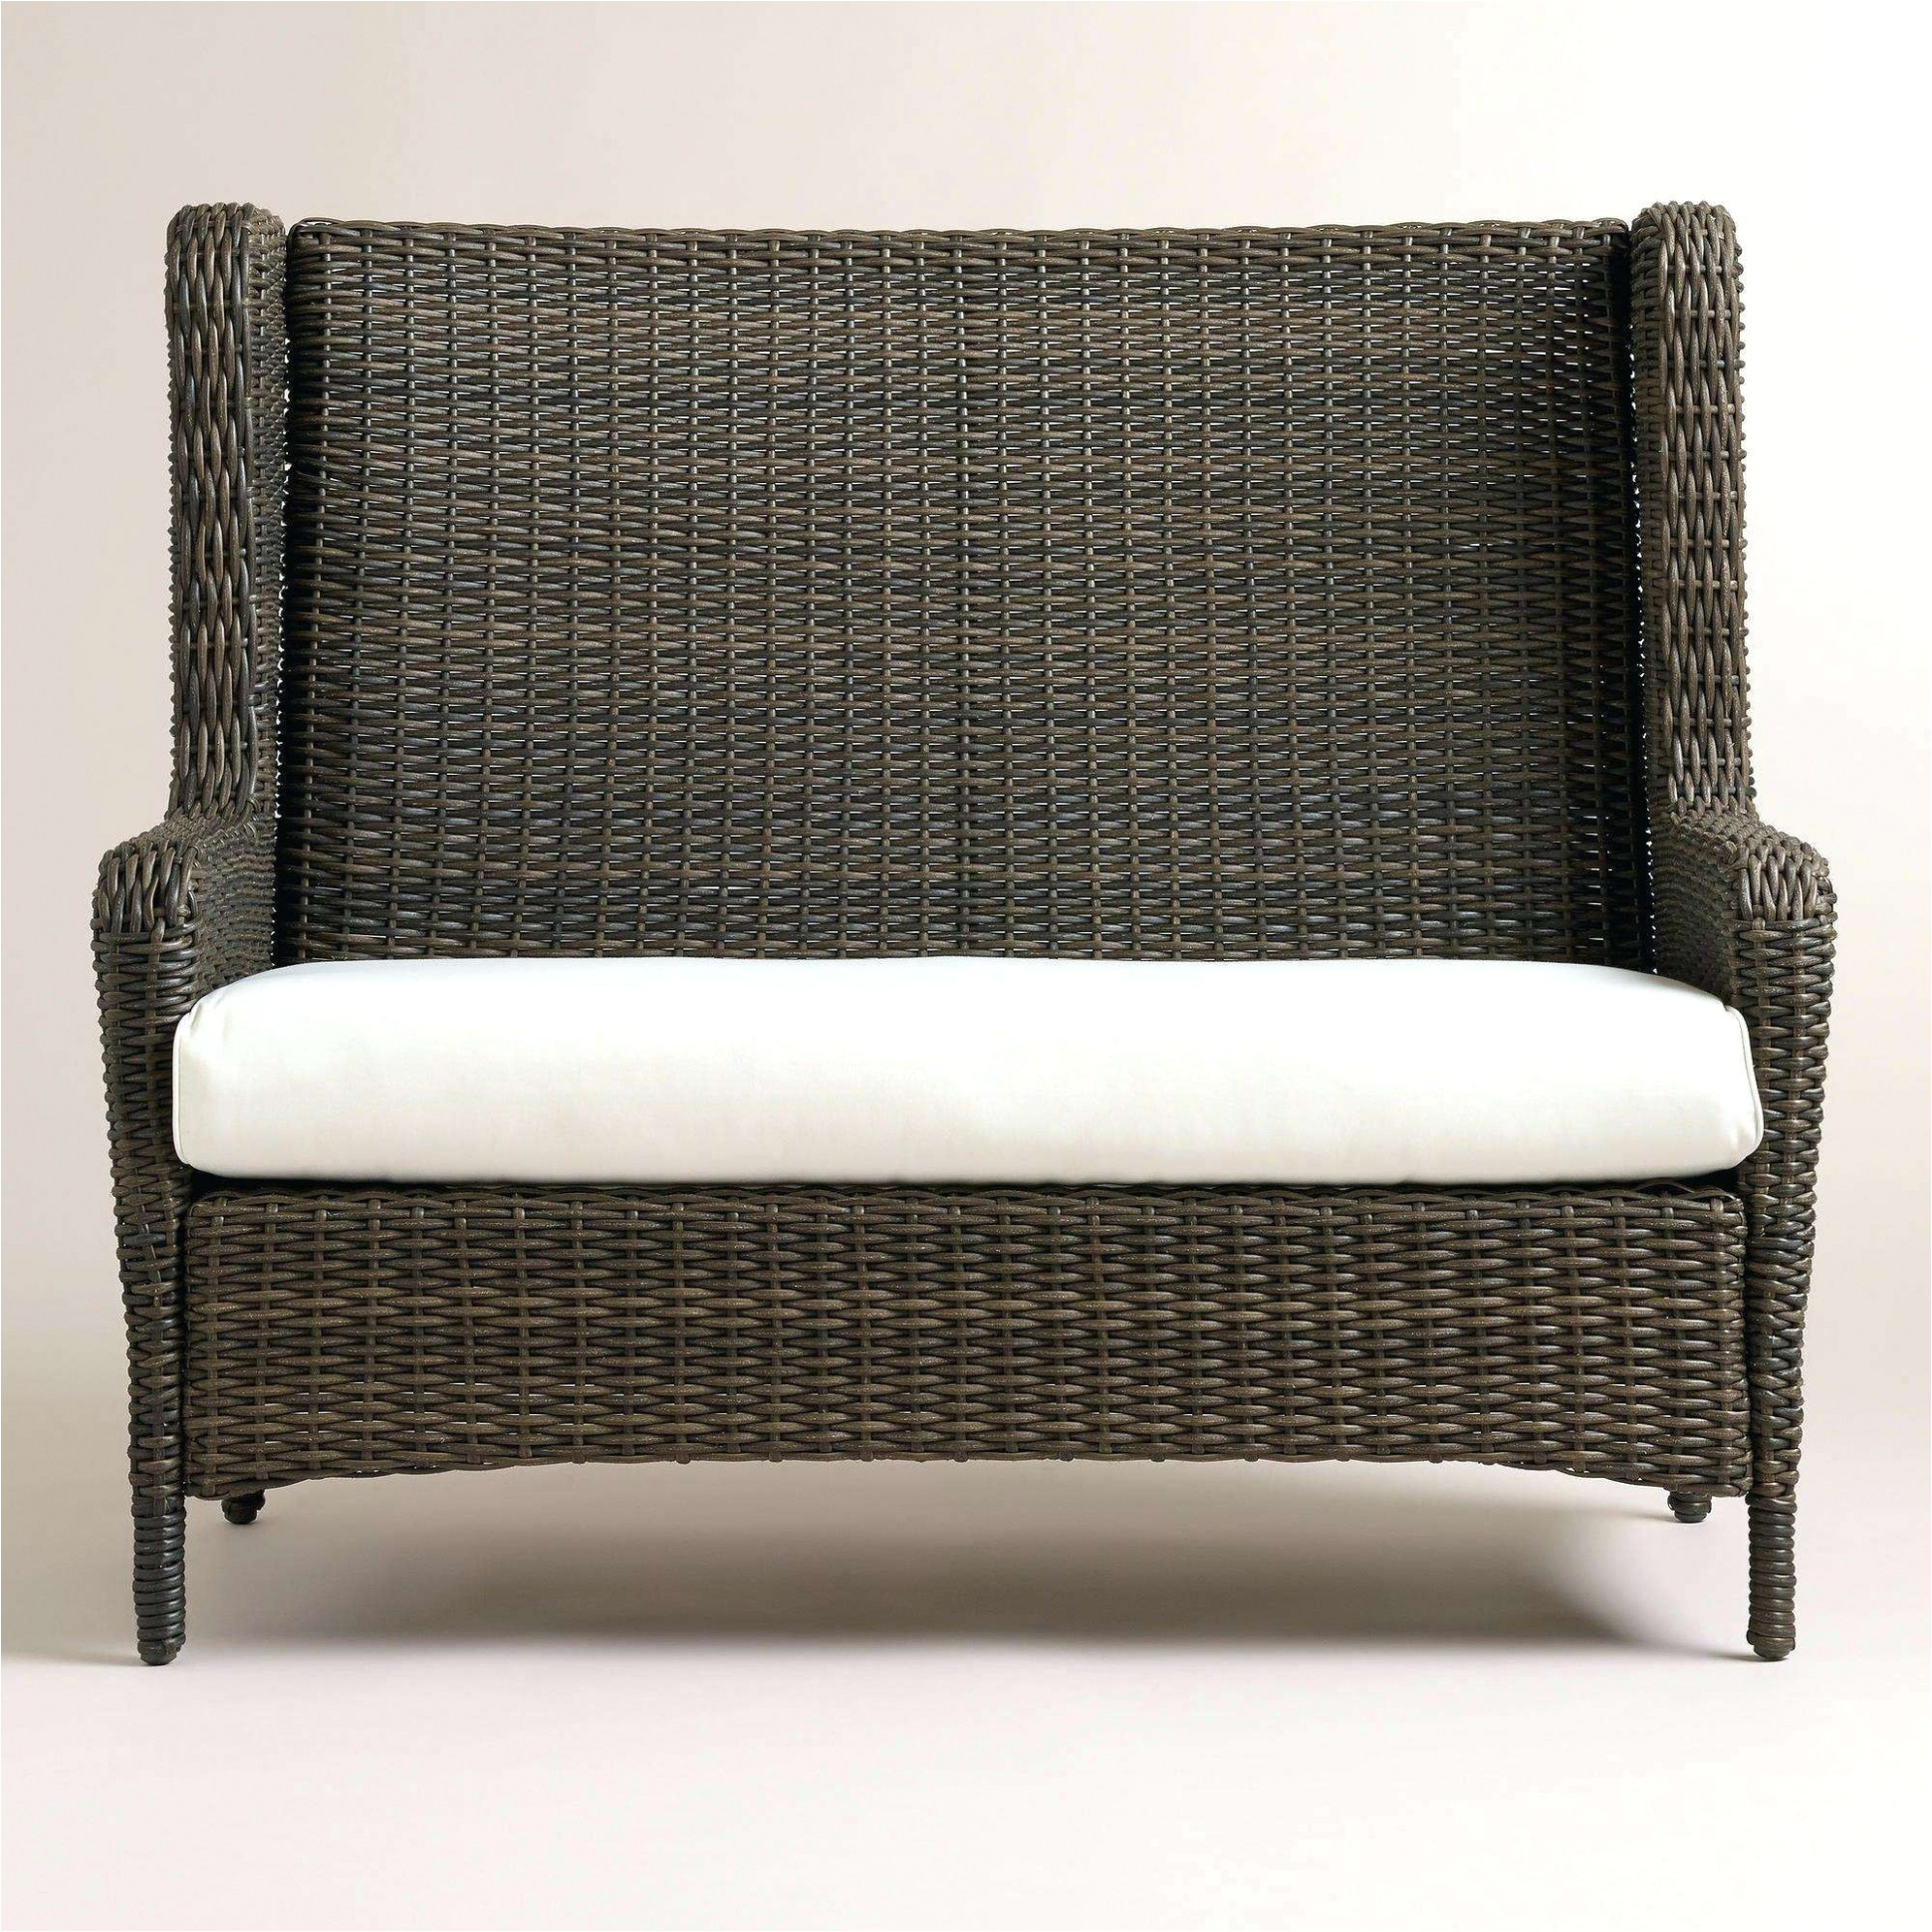 white hanging chair for bedroom unique indoor outdoor furniture best wicker outdoor sofa 0d patio chairs